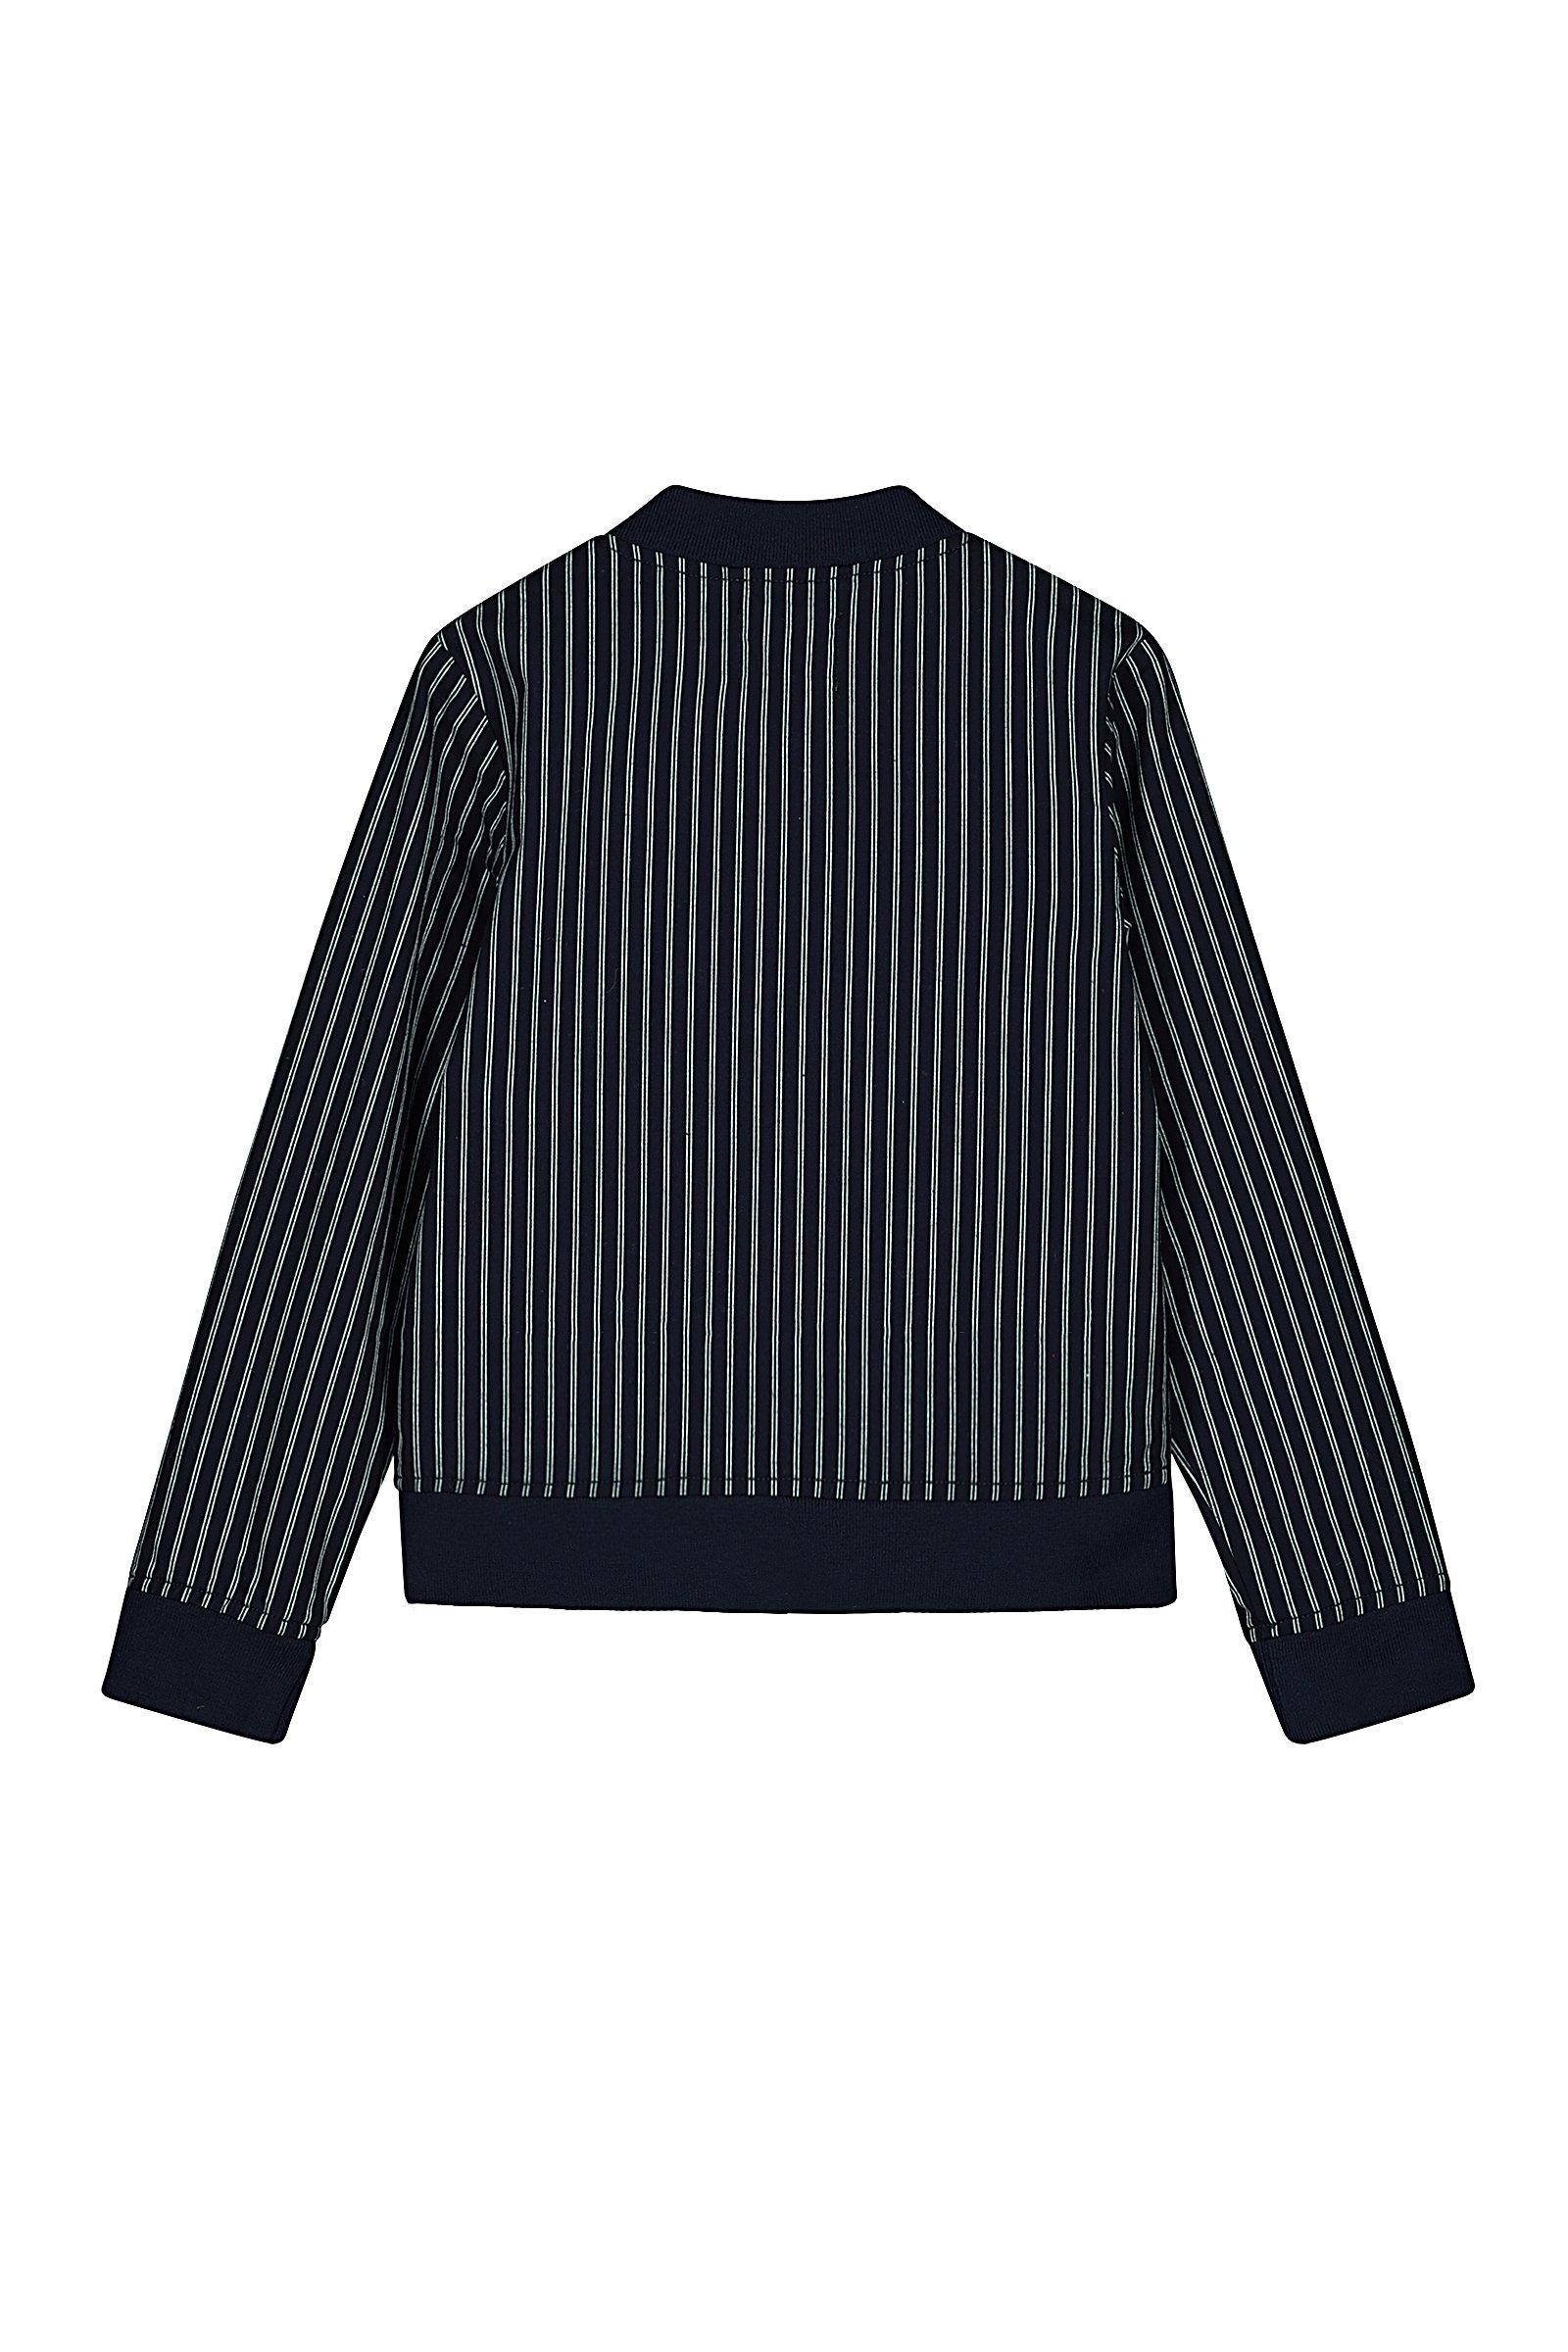 https://webmedia.cks-fashion.com/i/cks/123031BLM_100_h